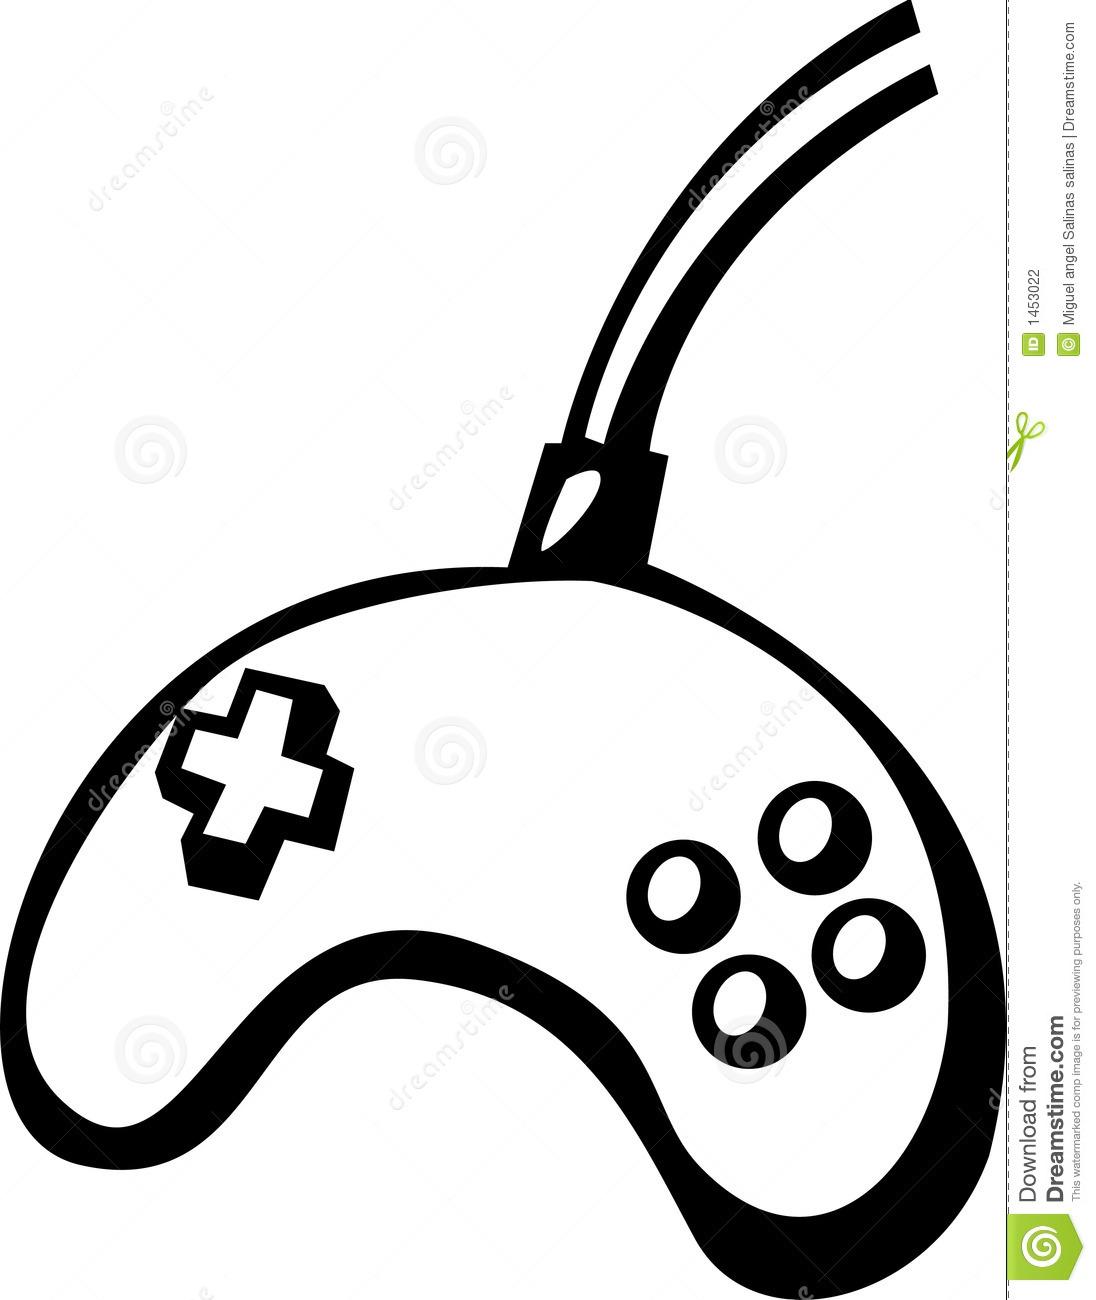 Game controller clipart atari black and white png freeuse download Controller Clipart | Free download best Controller Clipart on ... png freeuse download